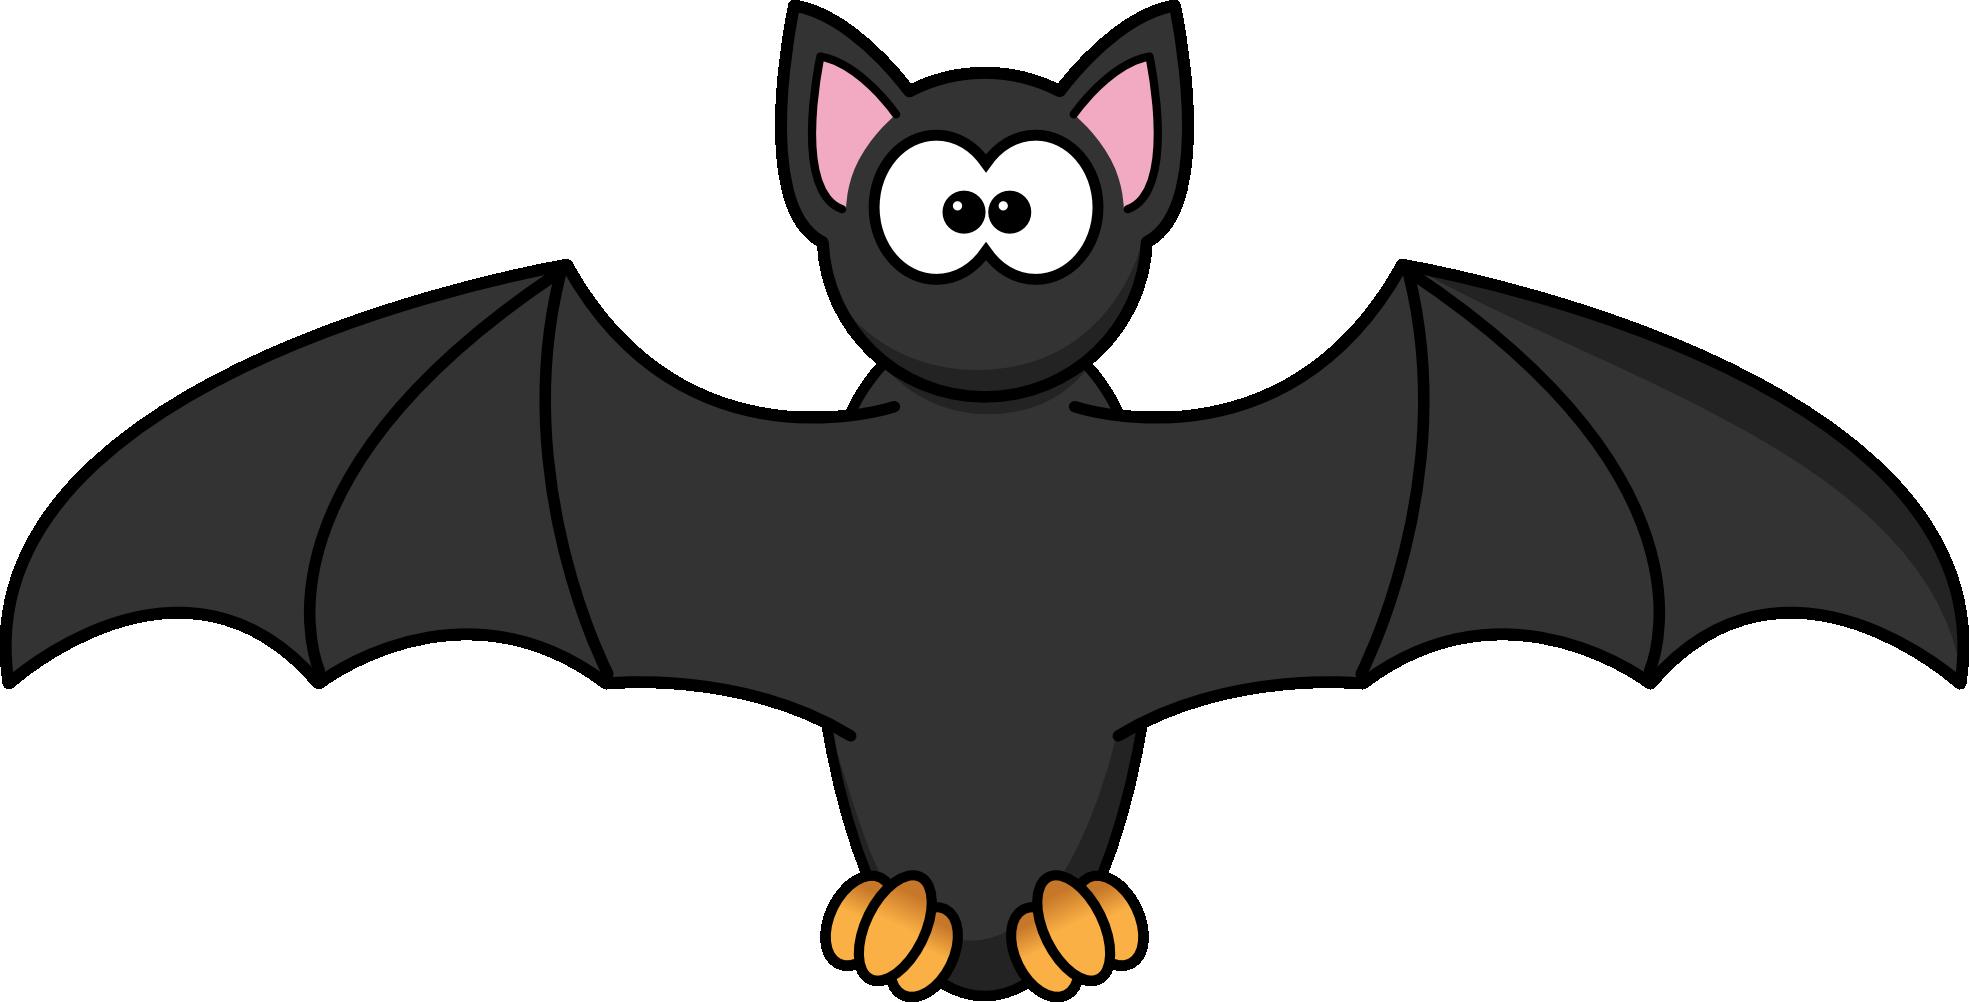 Cute Bat Clipart Clipart Panda Free Clipart Images